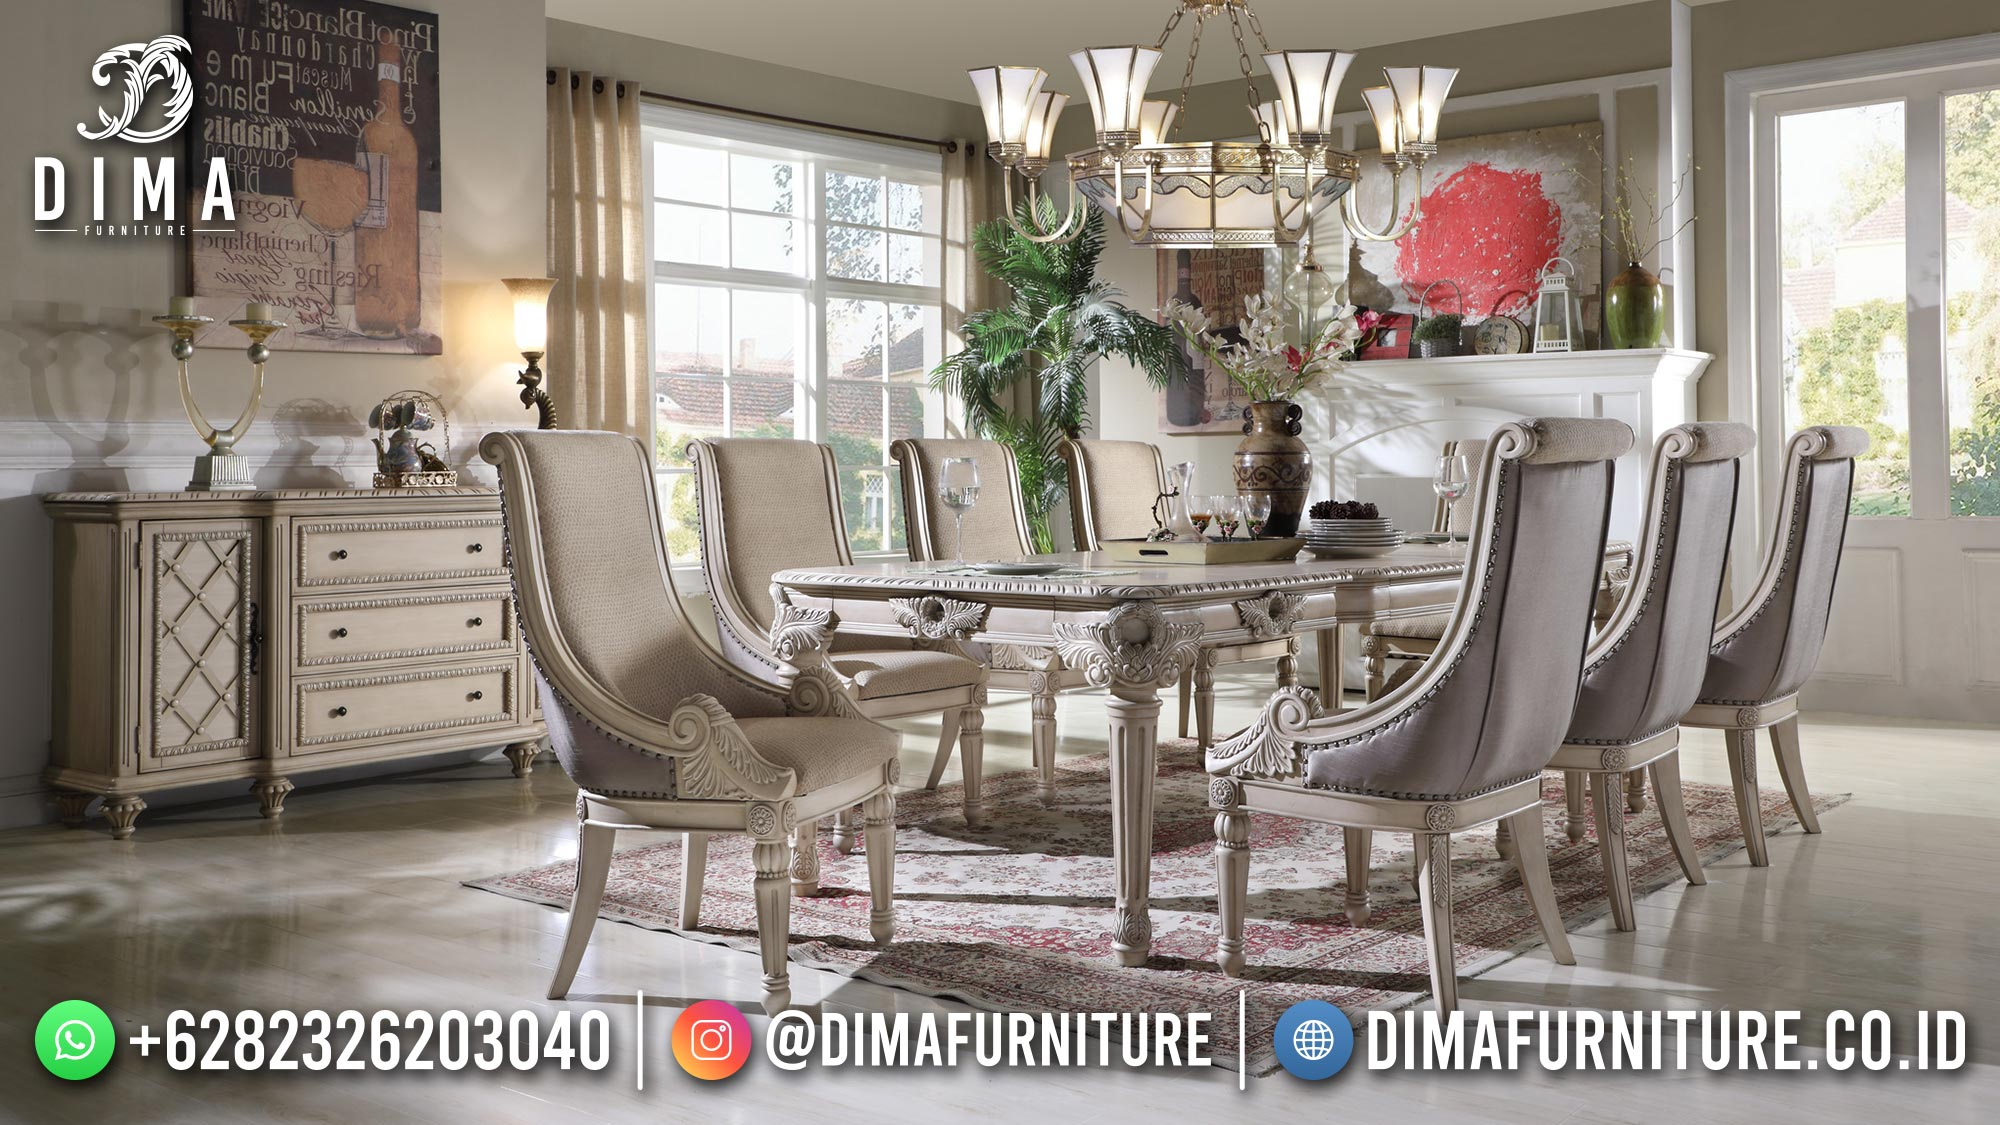 Meja Makan Mewah Jepara Excellent Color Luxurious Carving Design ST-1466